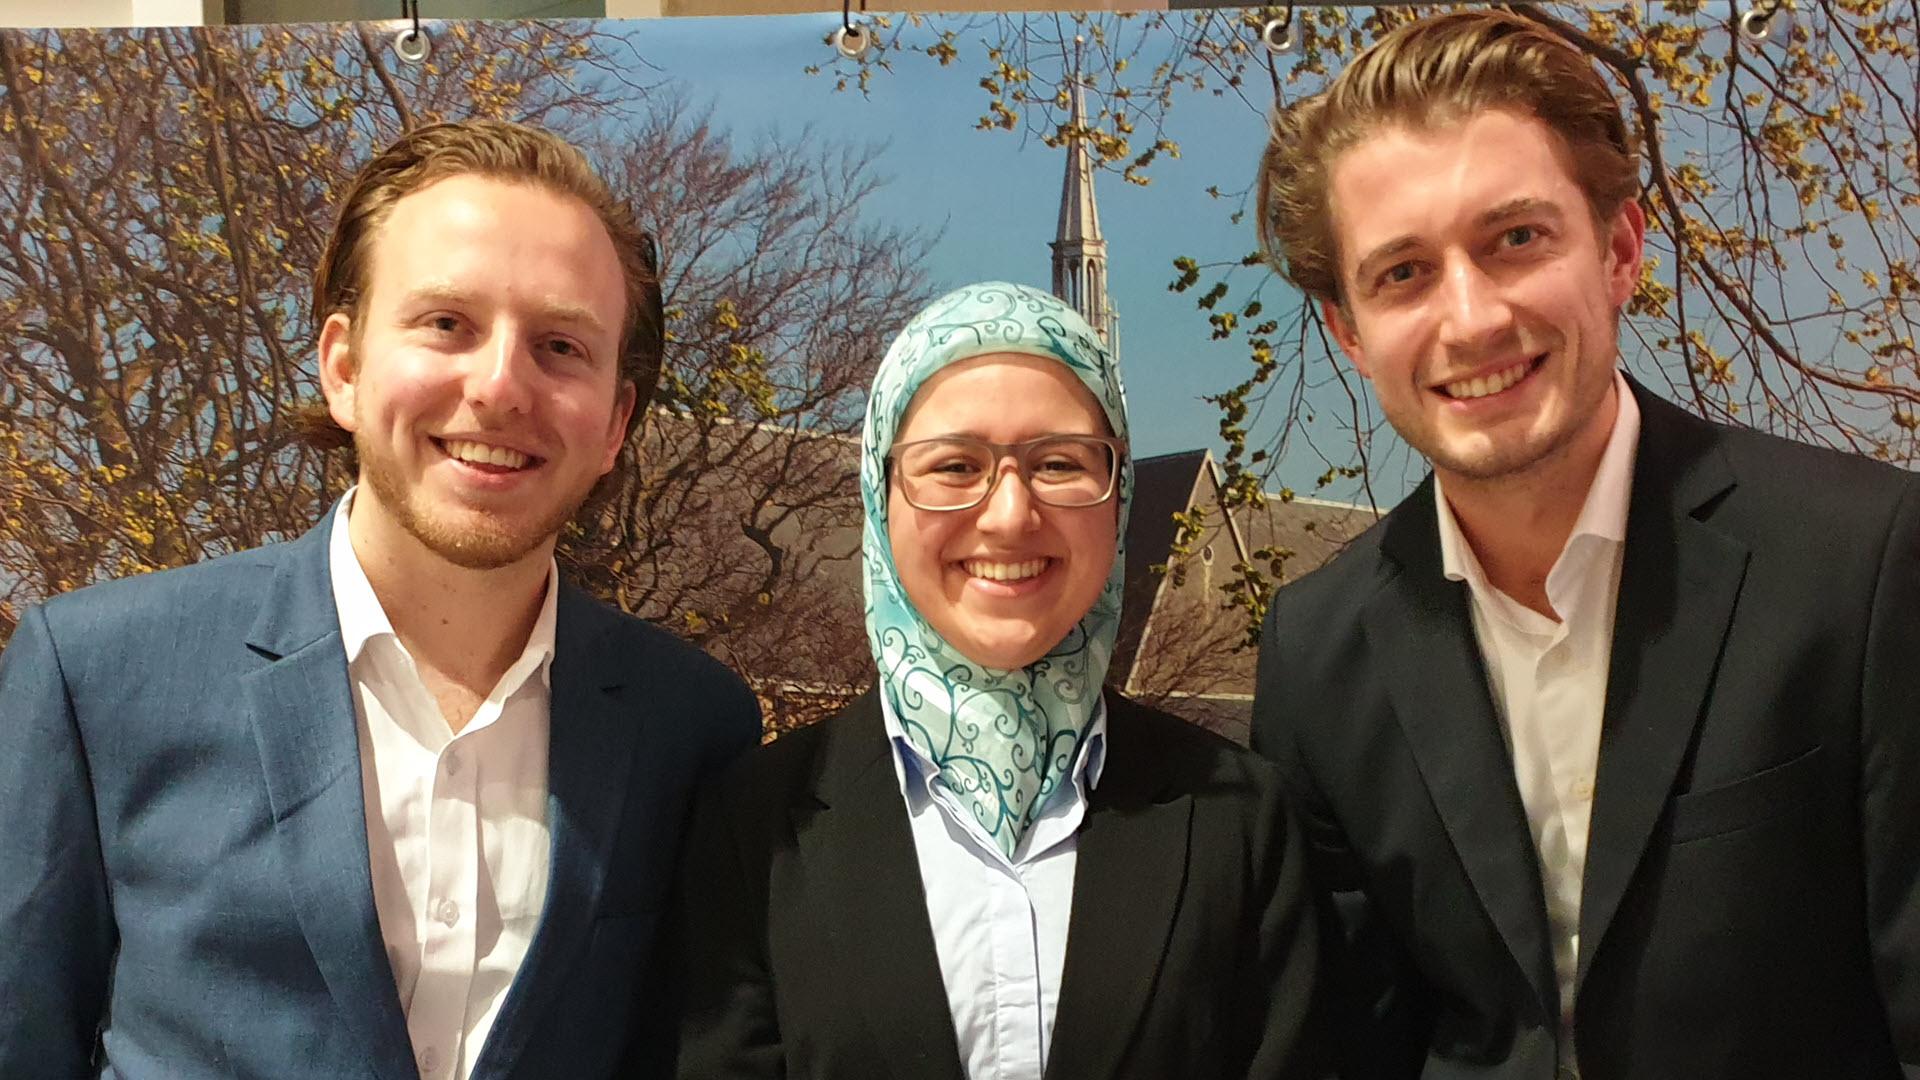 Nijbakker-Morra Stichting Prijswinnaars 2019-2020